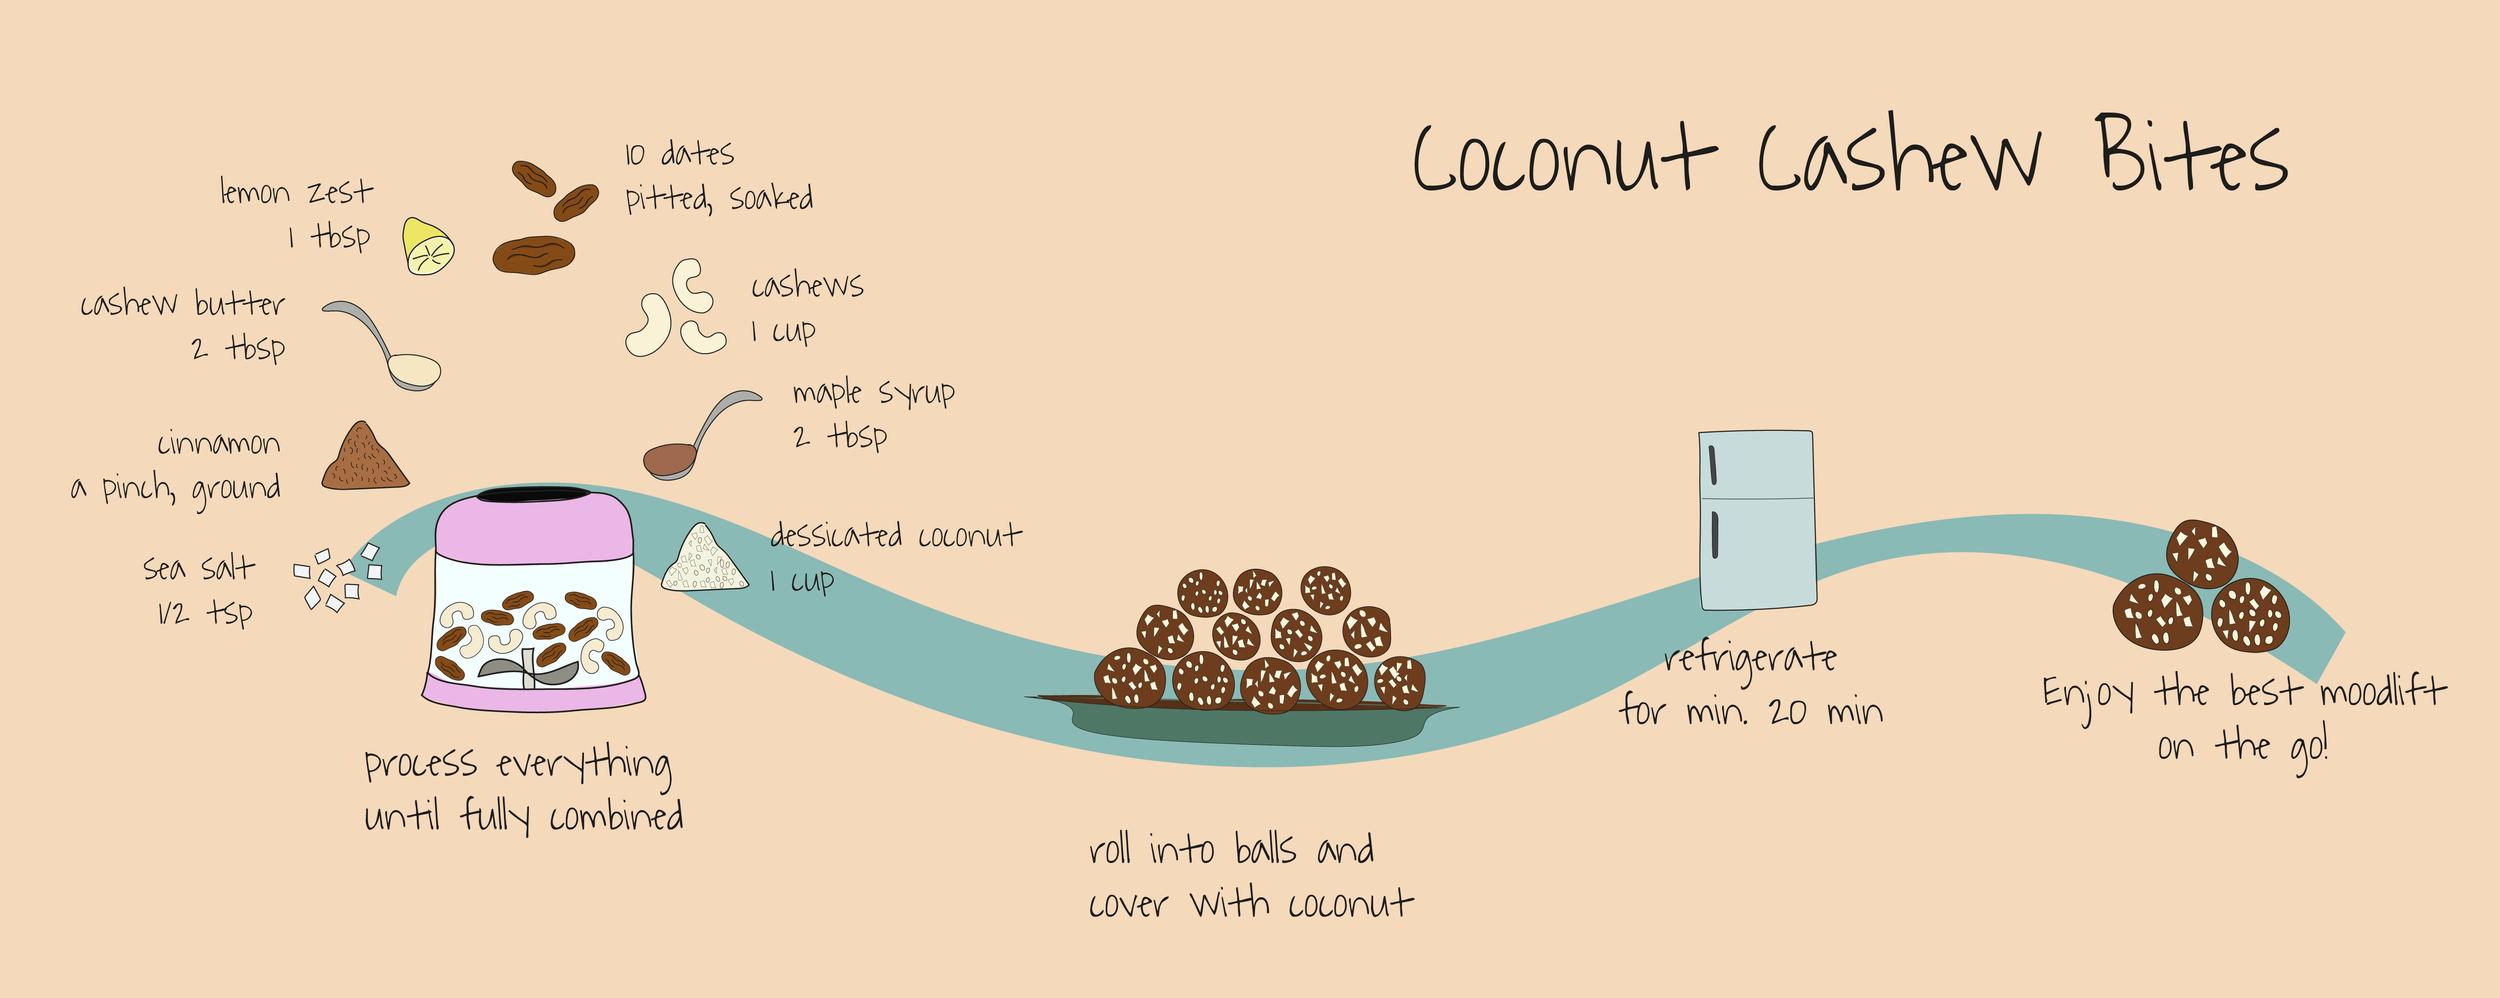 Coconut Cashew Bites